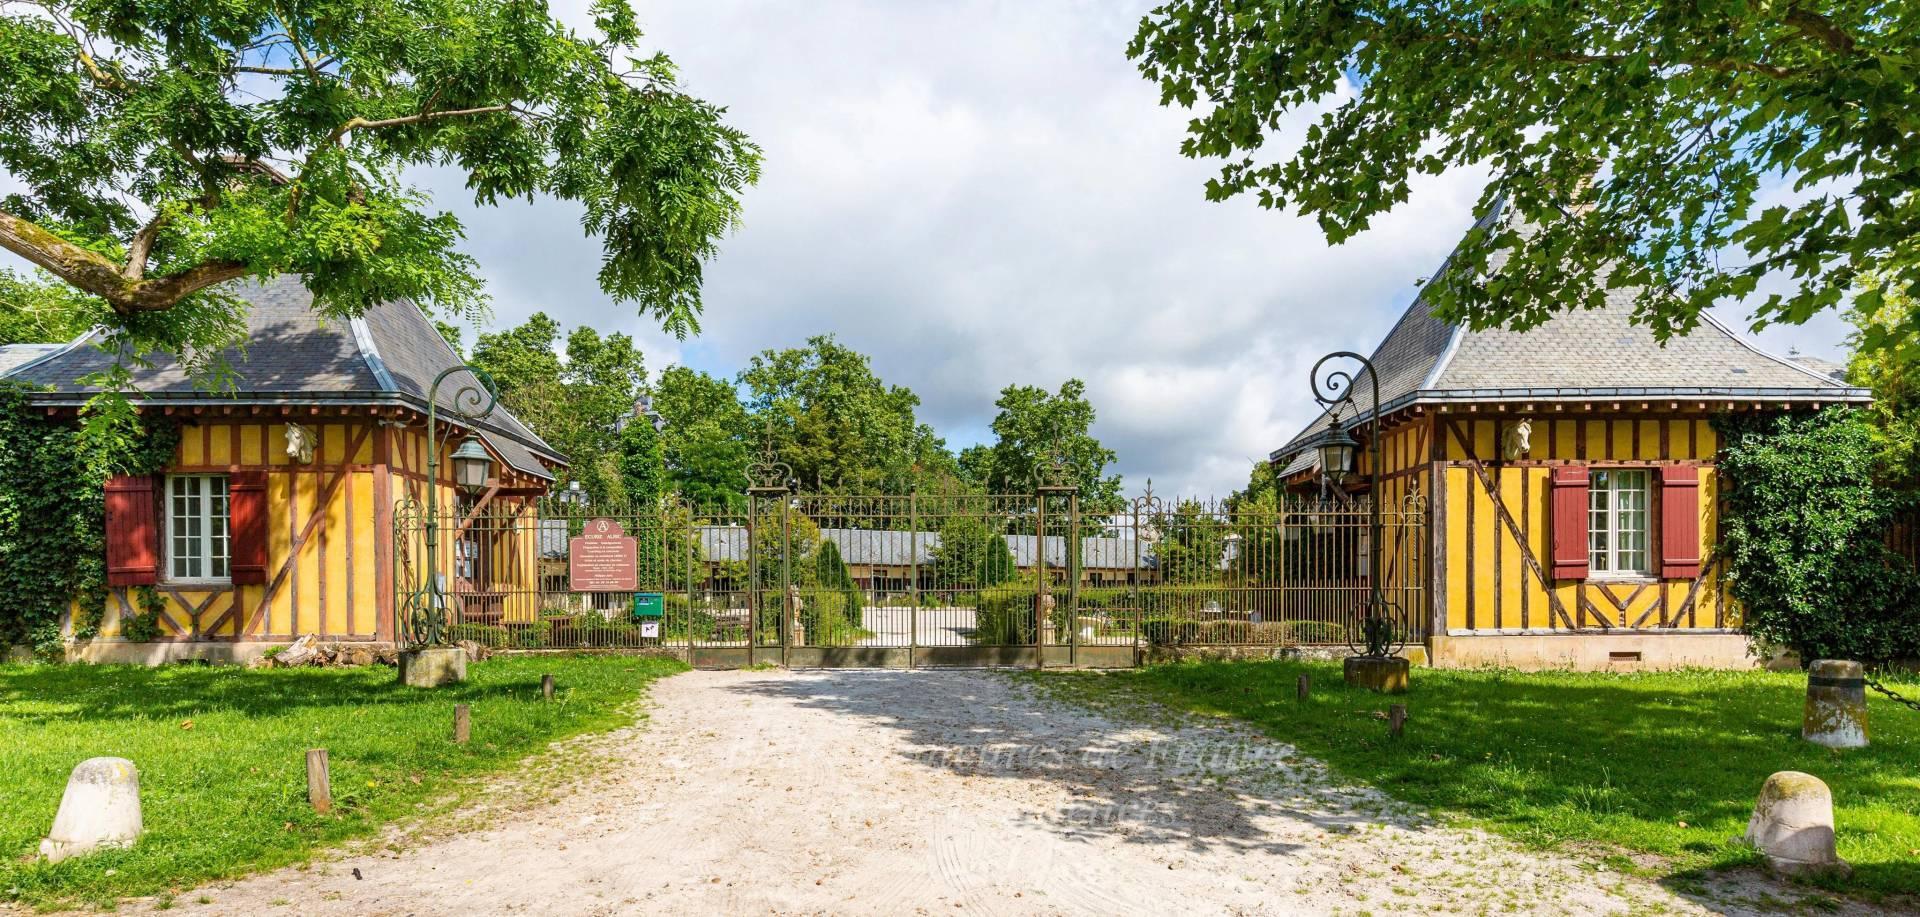 1 55 Maisons-Laffitte